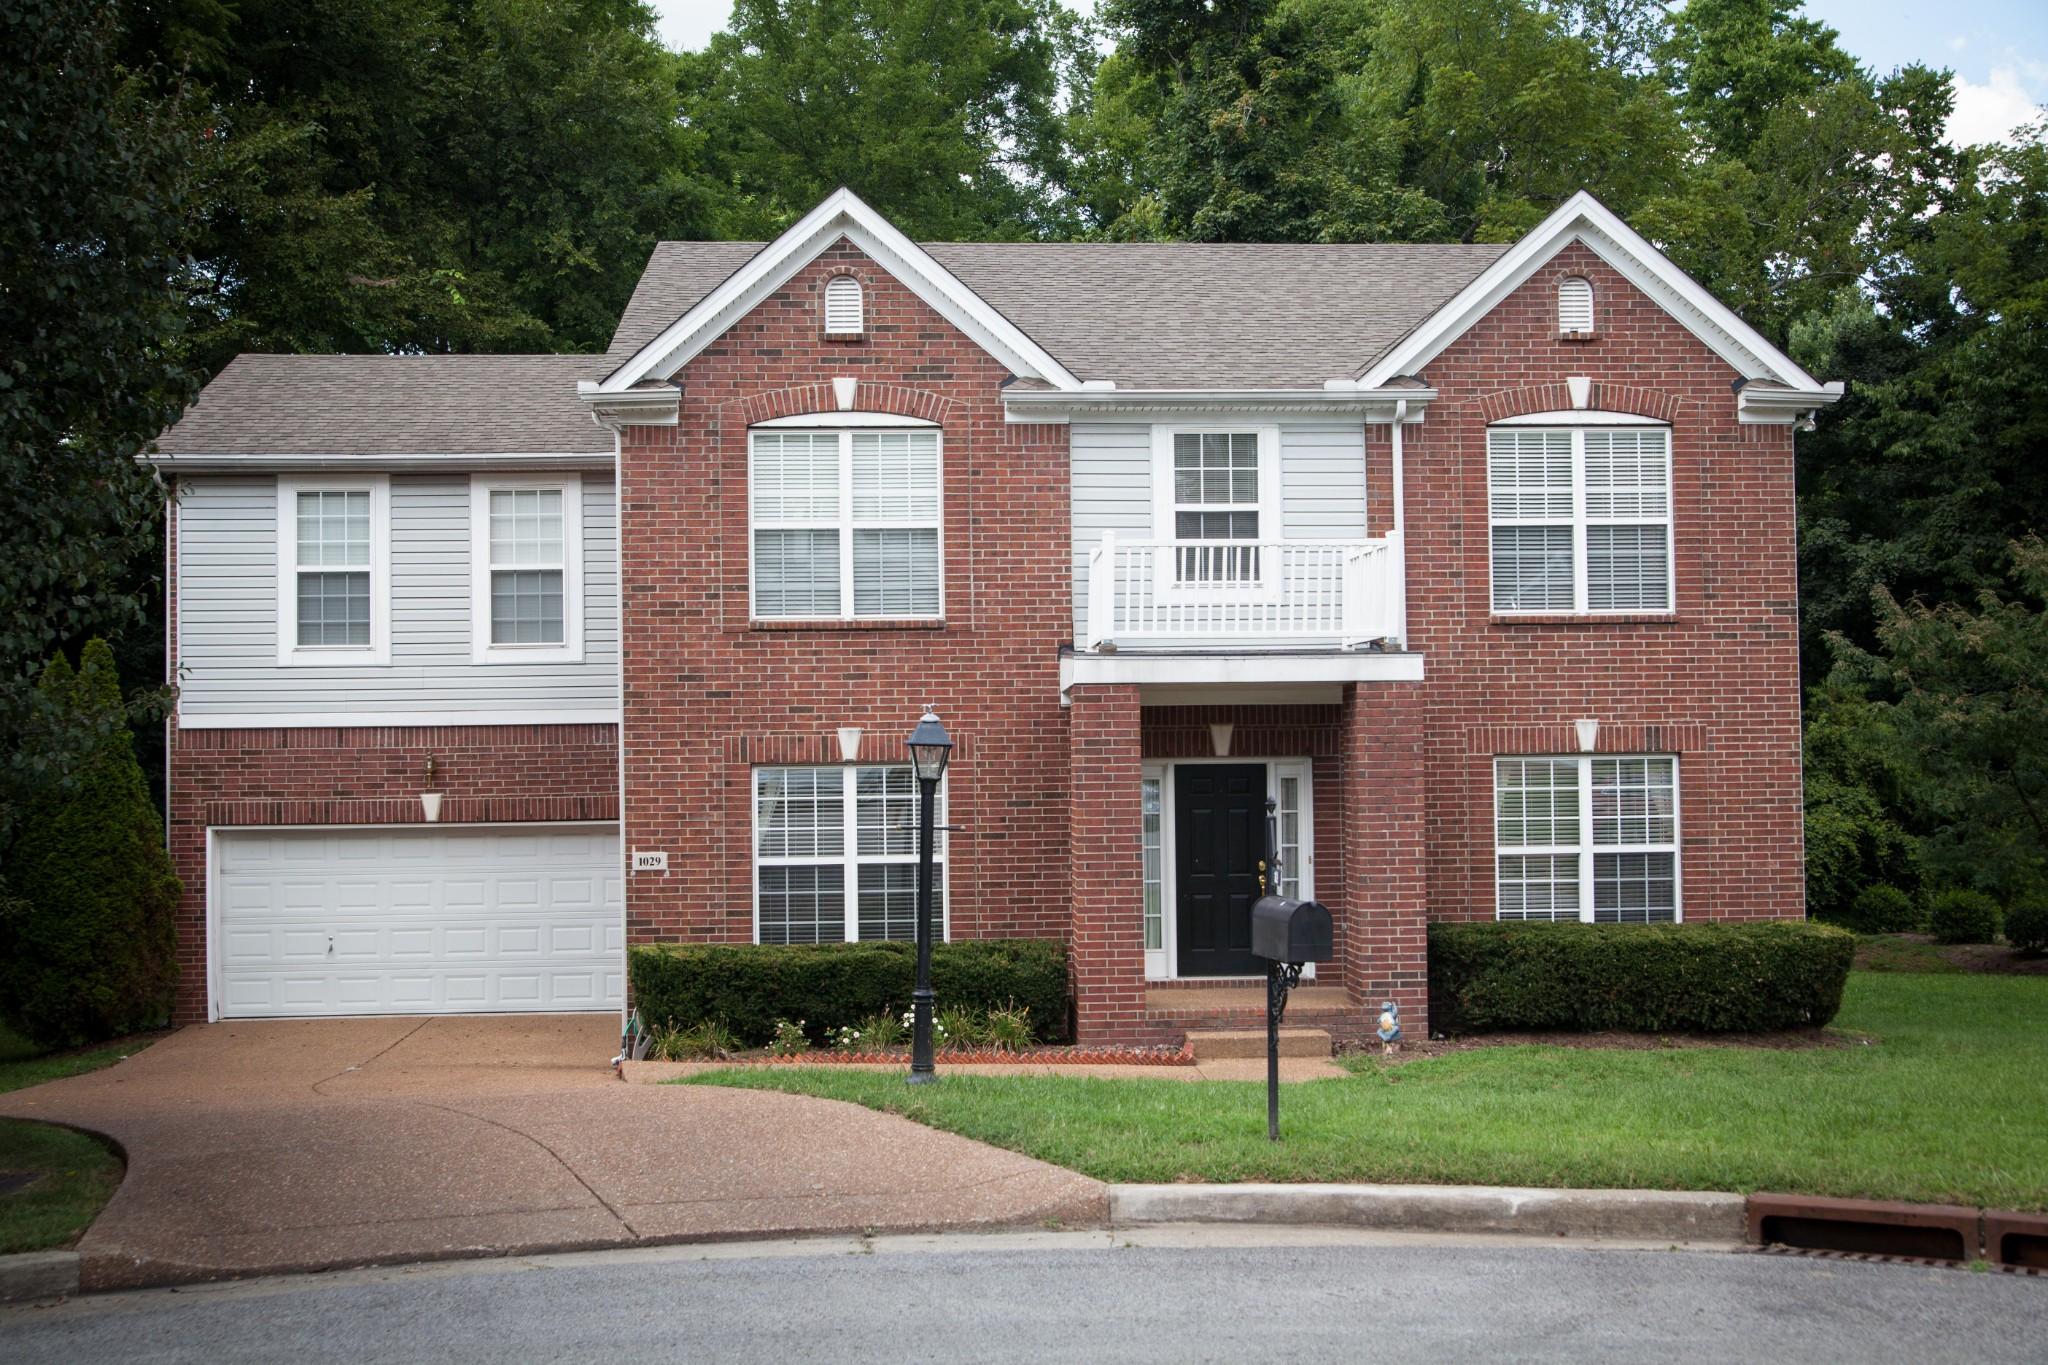 1029 Heathfield Cir Property Photo - Brentwood, TN real estate listing